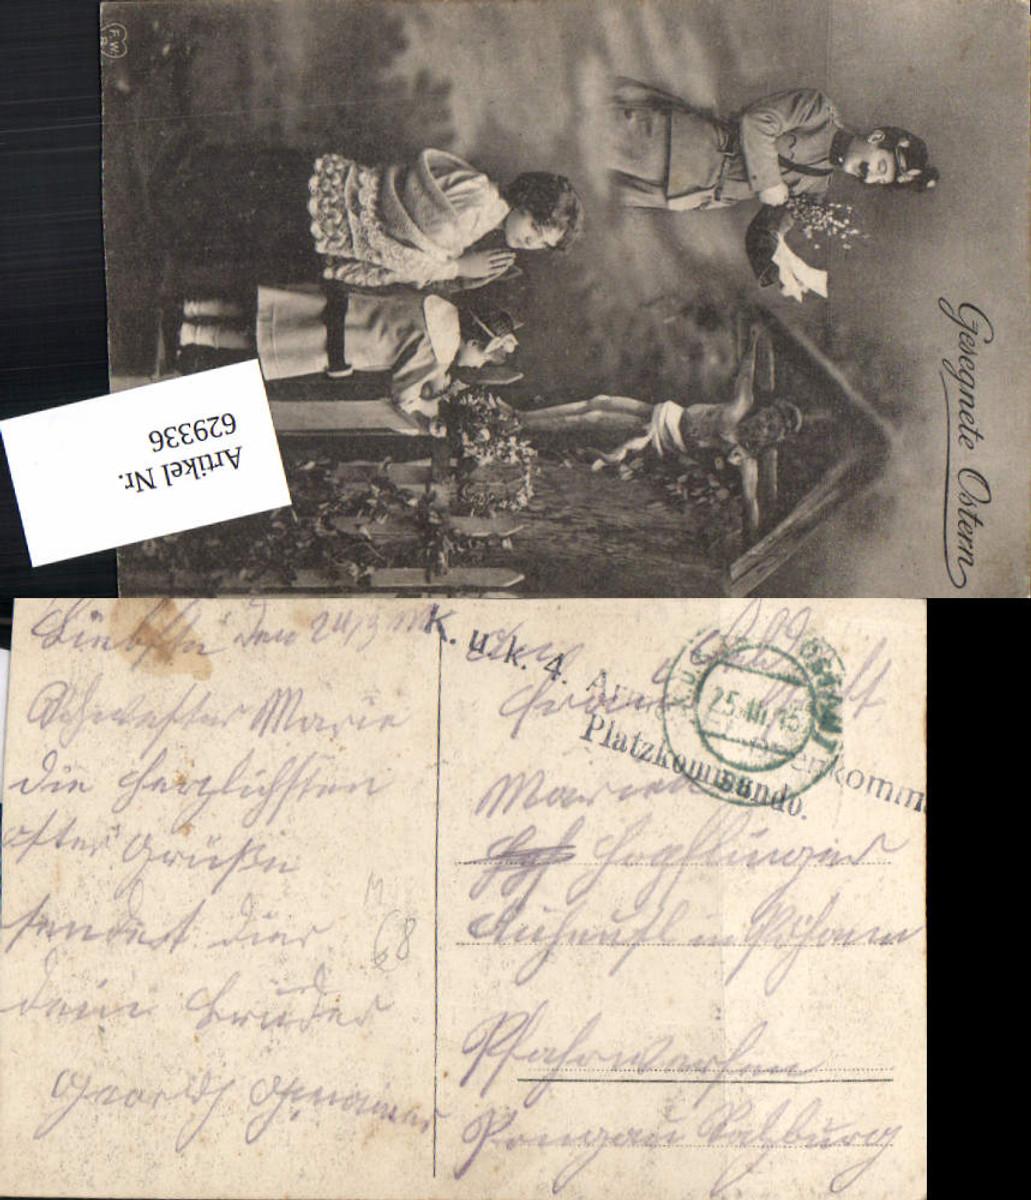 629336,K.K. Feldpost 4. Armee Etappenkommando Platzkommando Marterl Soldat Patriotik günstig online kaufen